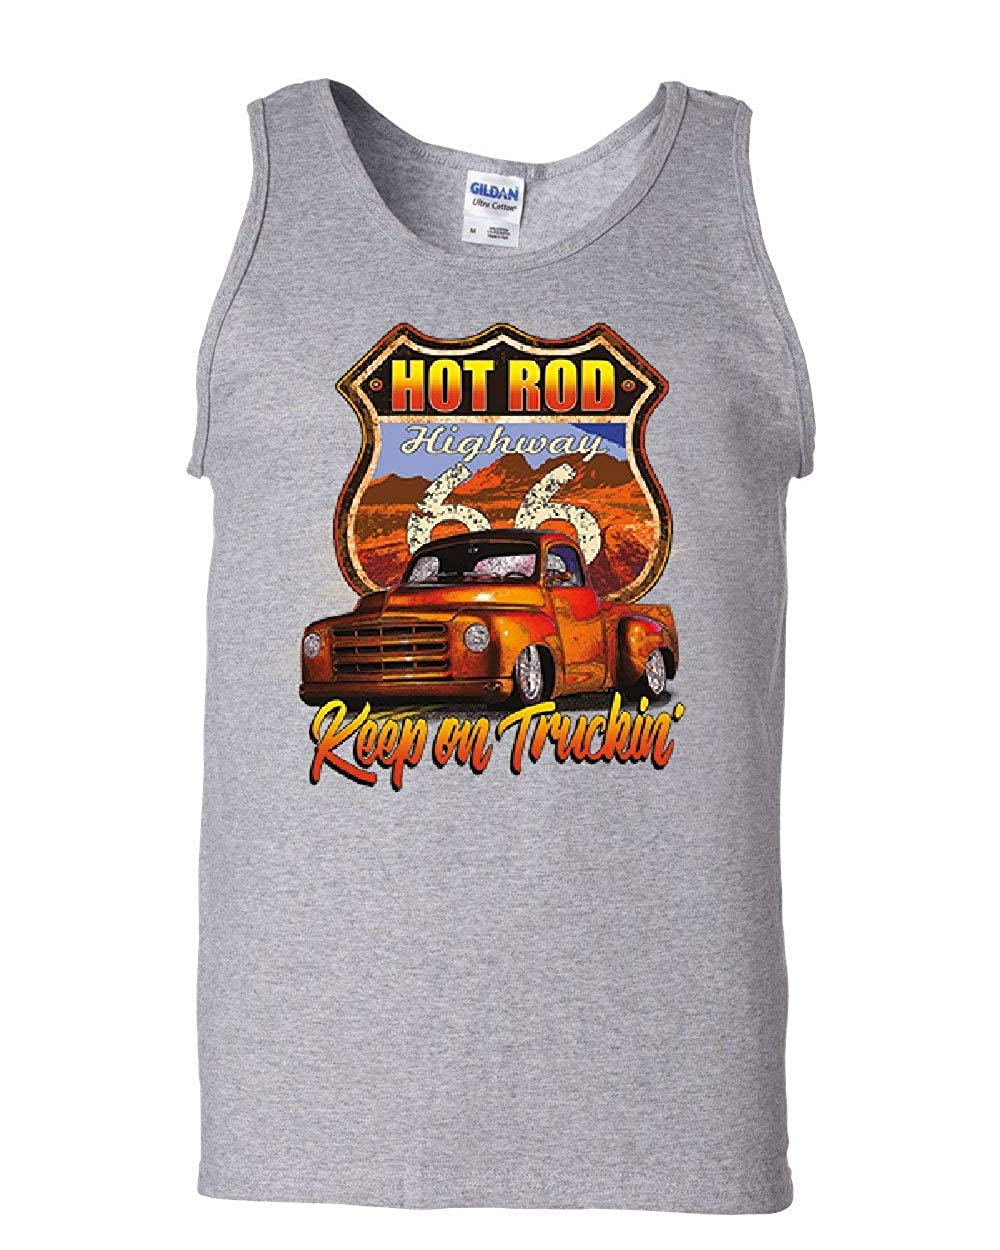 Hot Rod Highway Keep on Truckin Tank Top Route 66 Retro Pickup Sleeveless